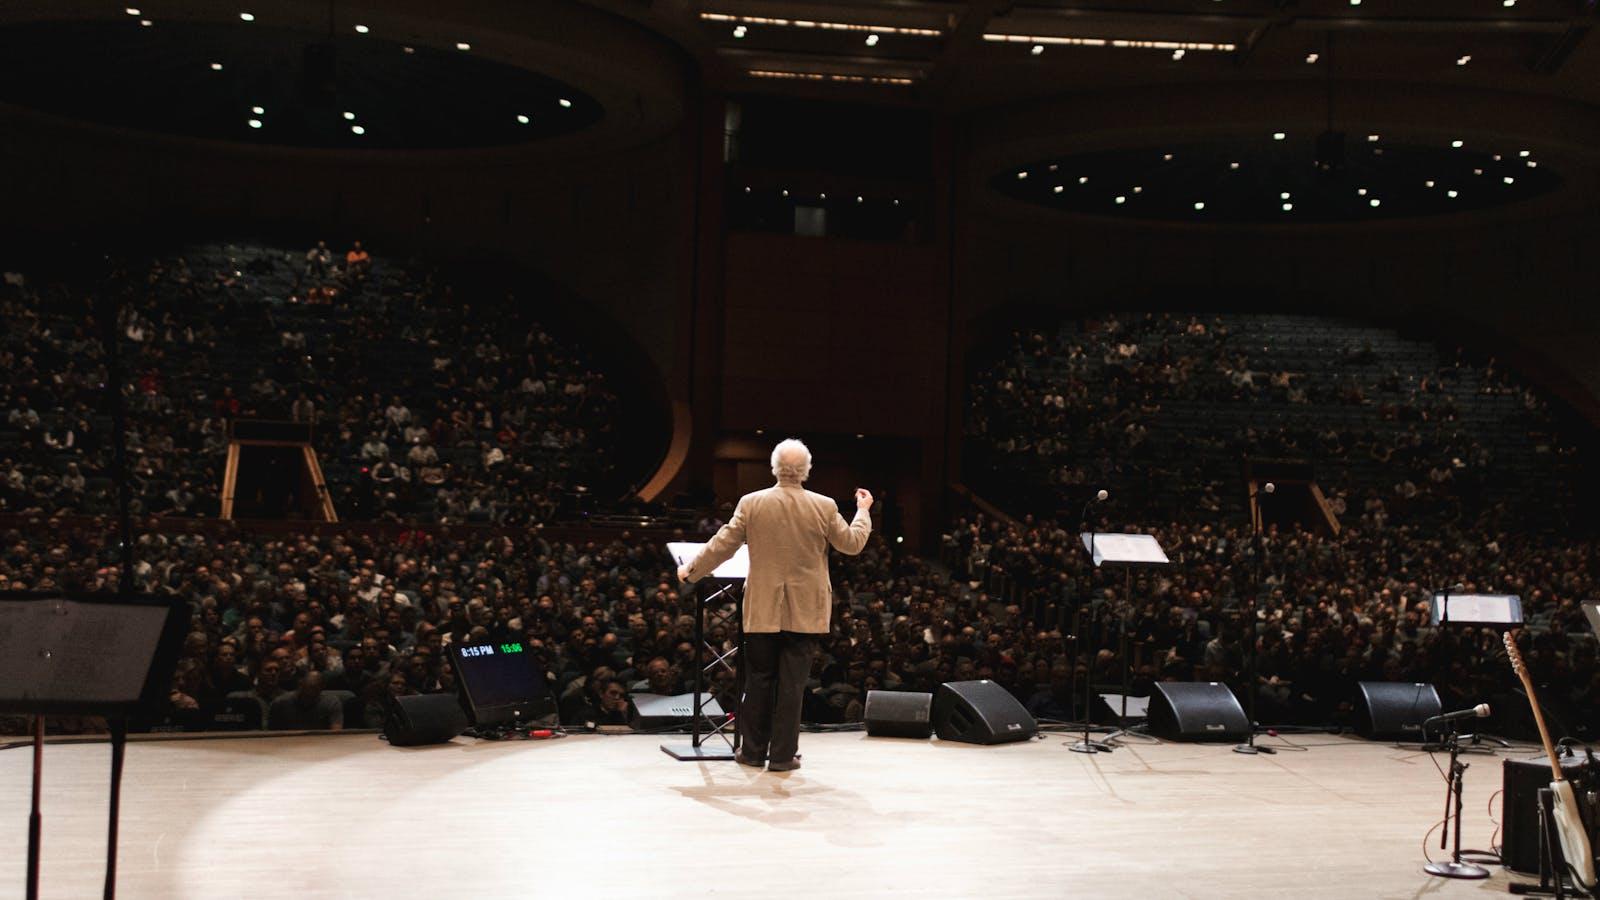 How to Seek the Holy Spirit | Desiring God